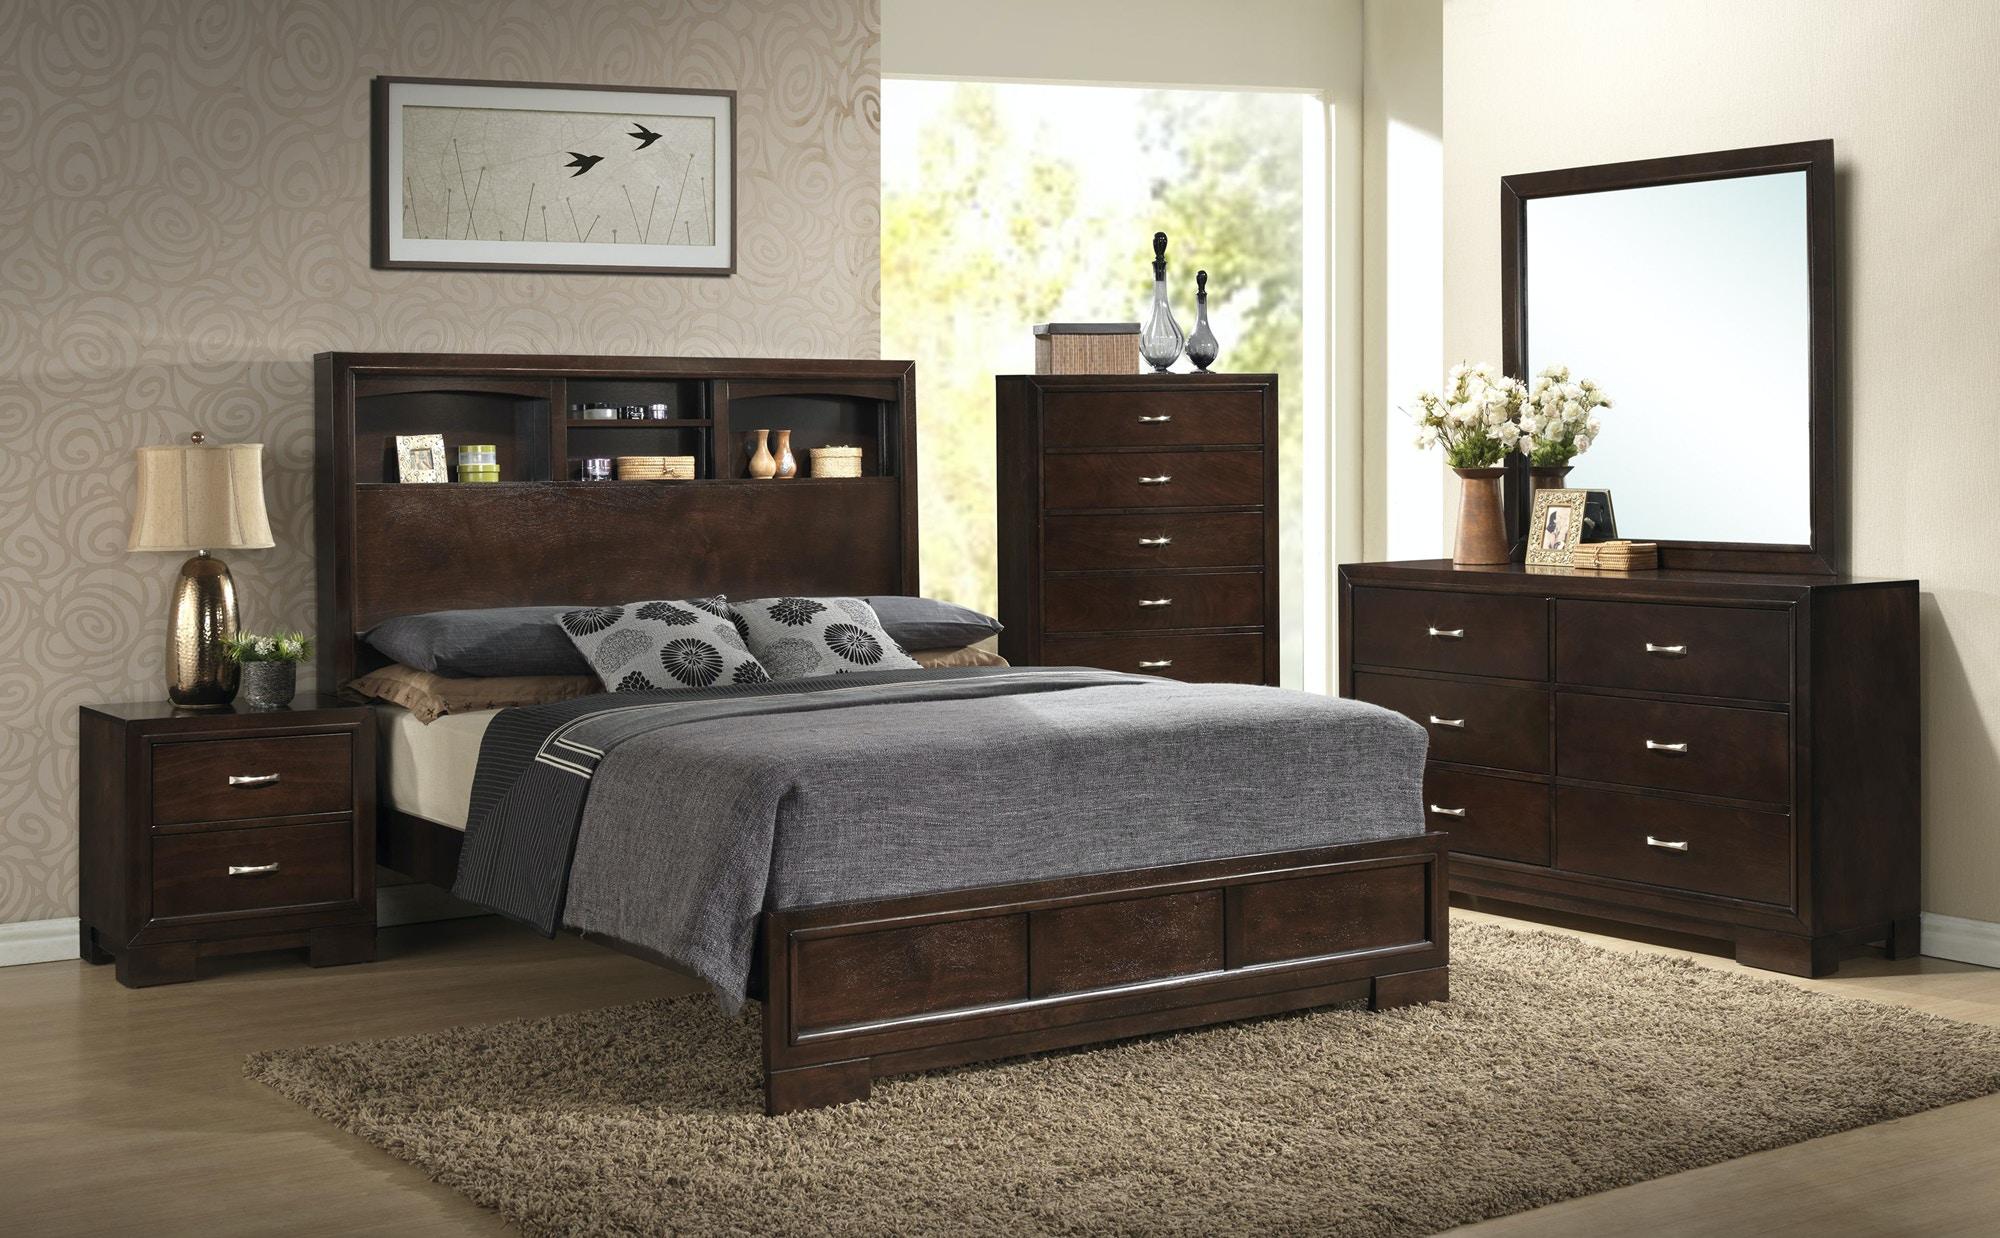 Lifestyle Bedroom Alameda Bookcase Bed Queen Furniture